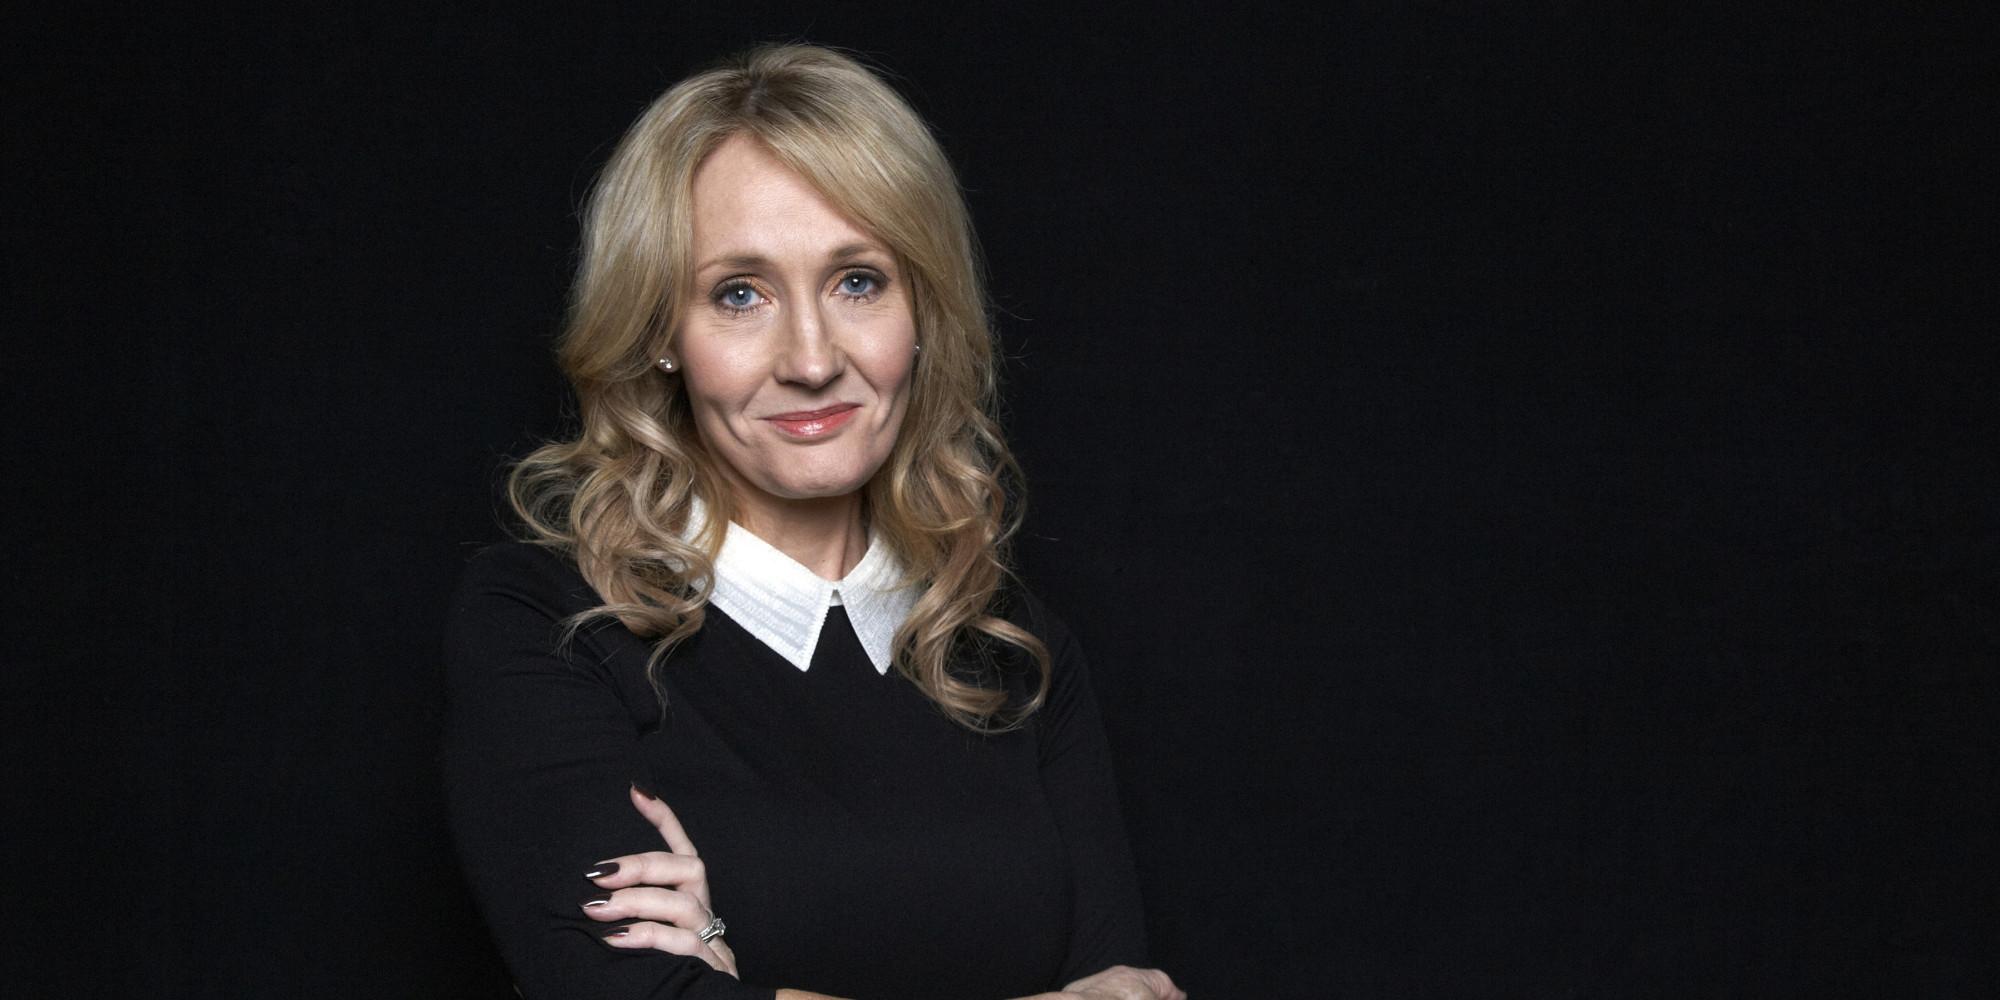 「J. K. Rowling」の画像検索結果